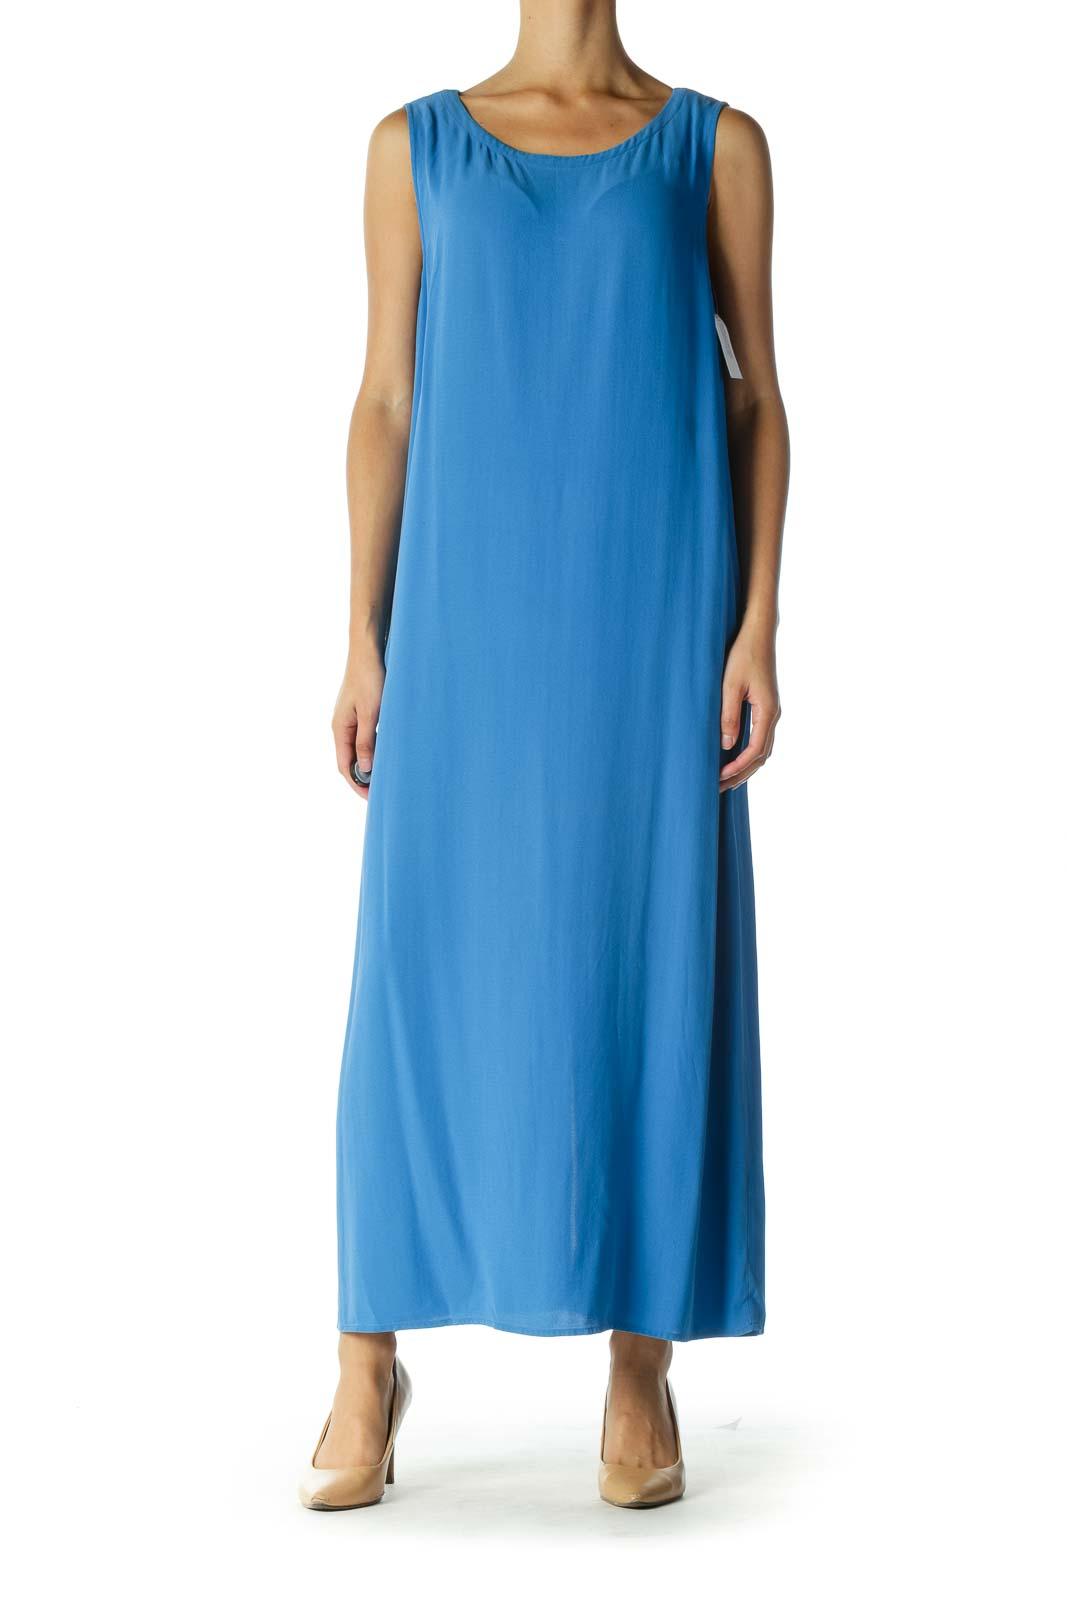 Blue Sleeveless Maxi Dress Front